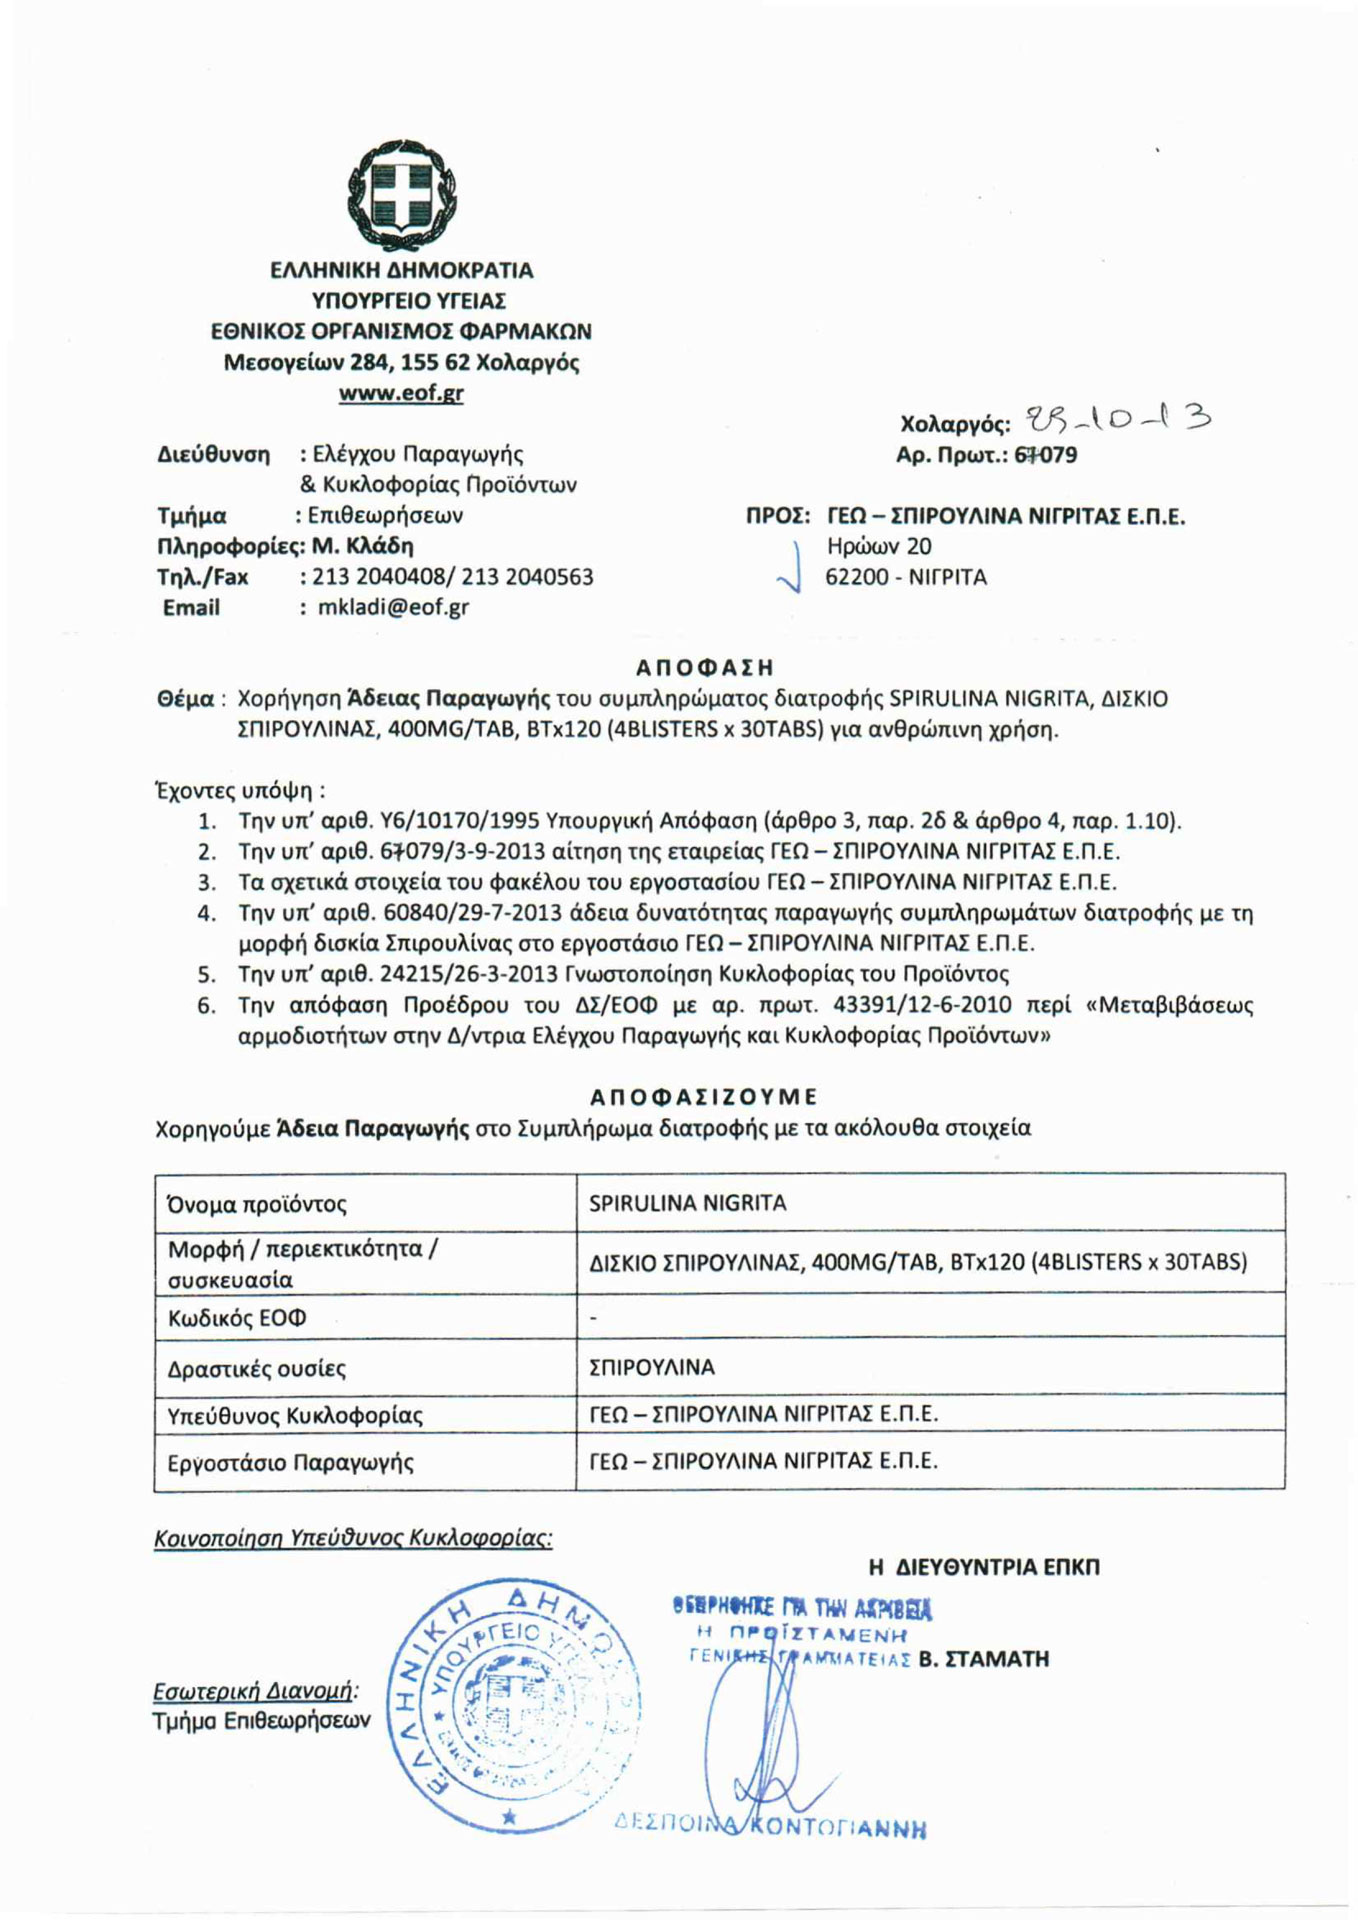 spirulina nigrita σπιρουλινα σερρων σπιρουλίνα νιγρίτας iodium free